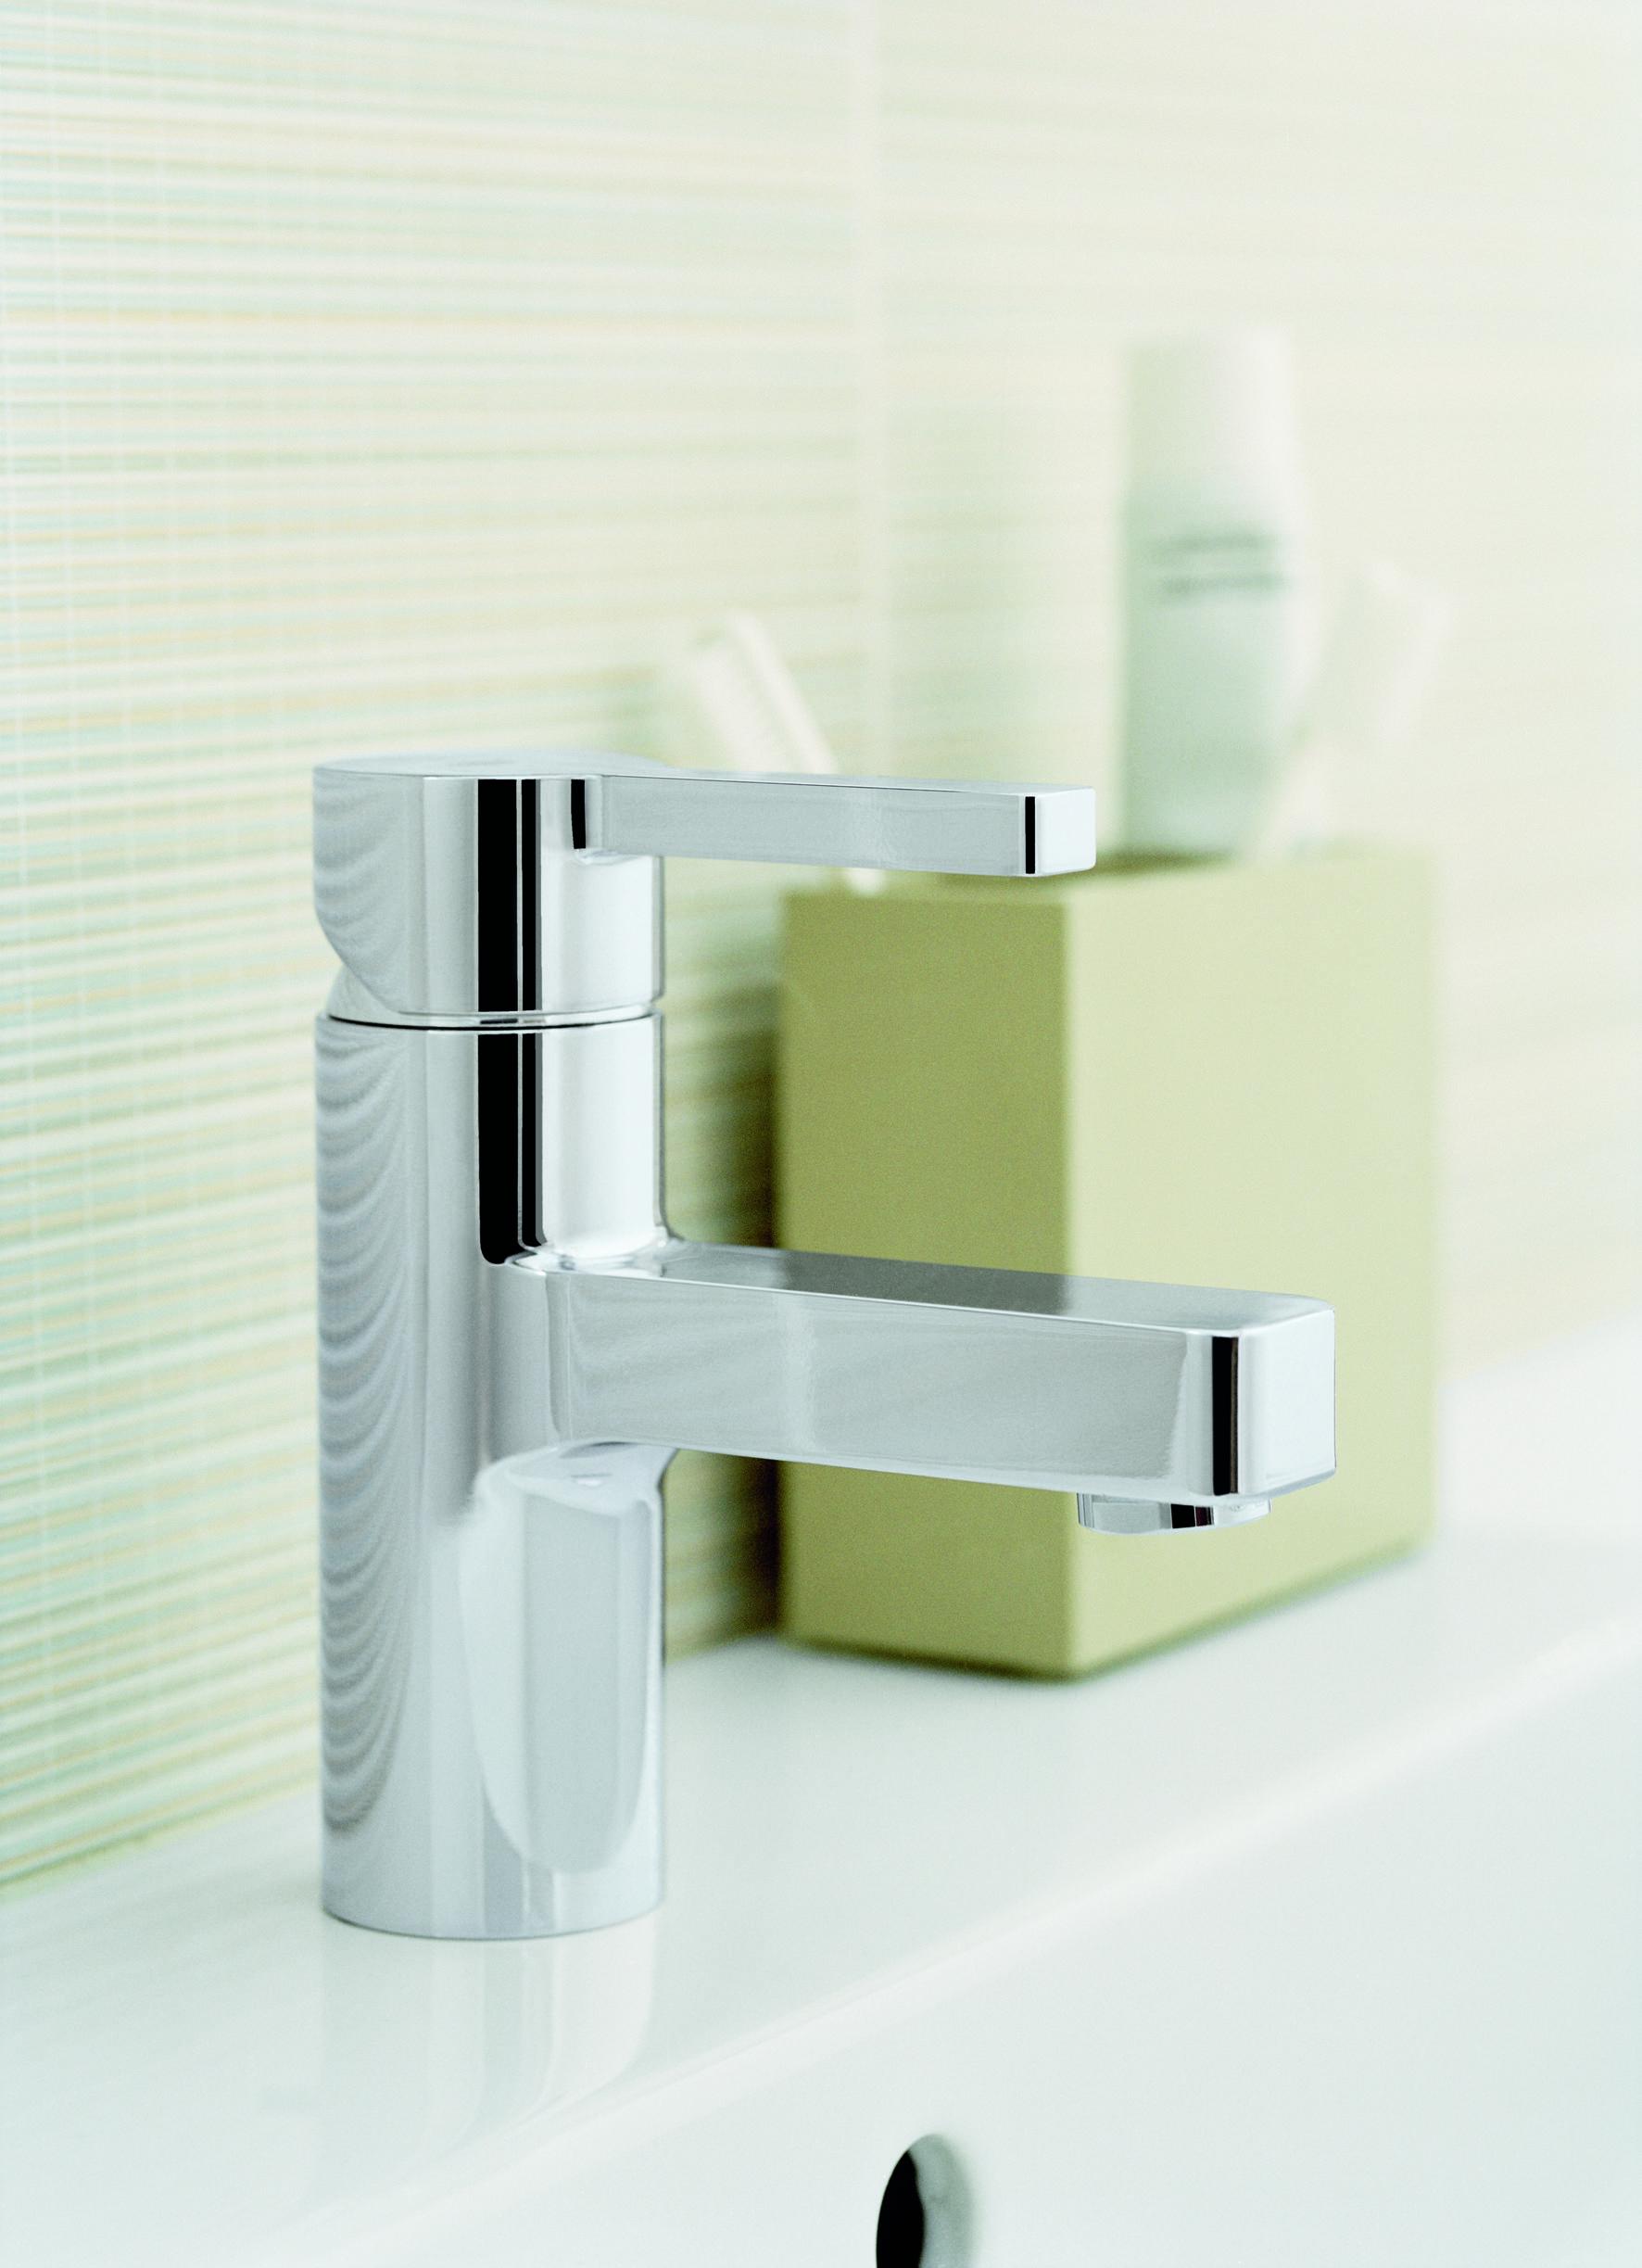 Lineare Basin Mixer | BATHROOMS - Sinks & Tapware | Pinterest ...